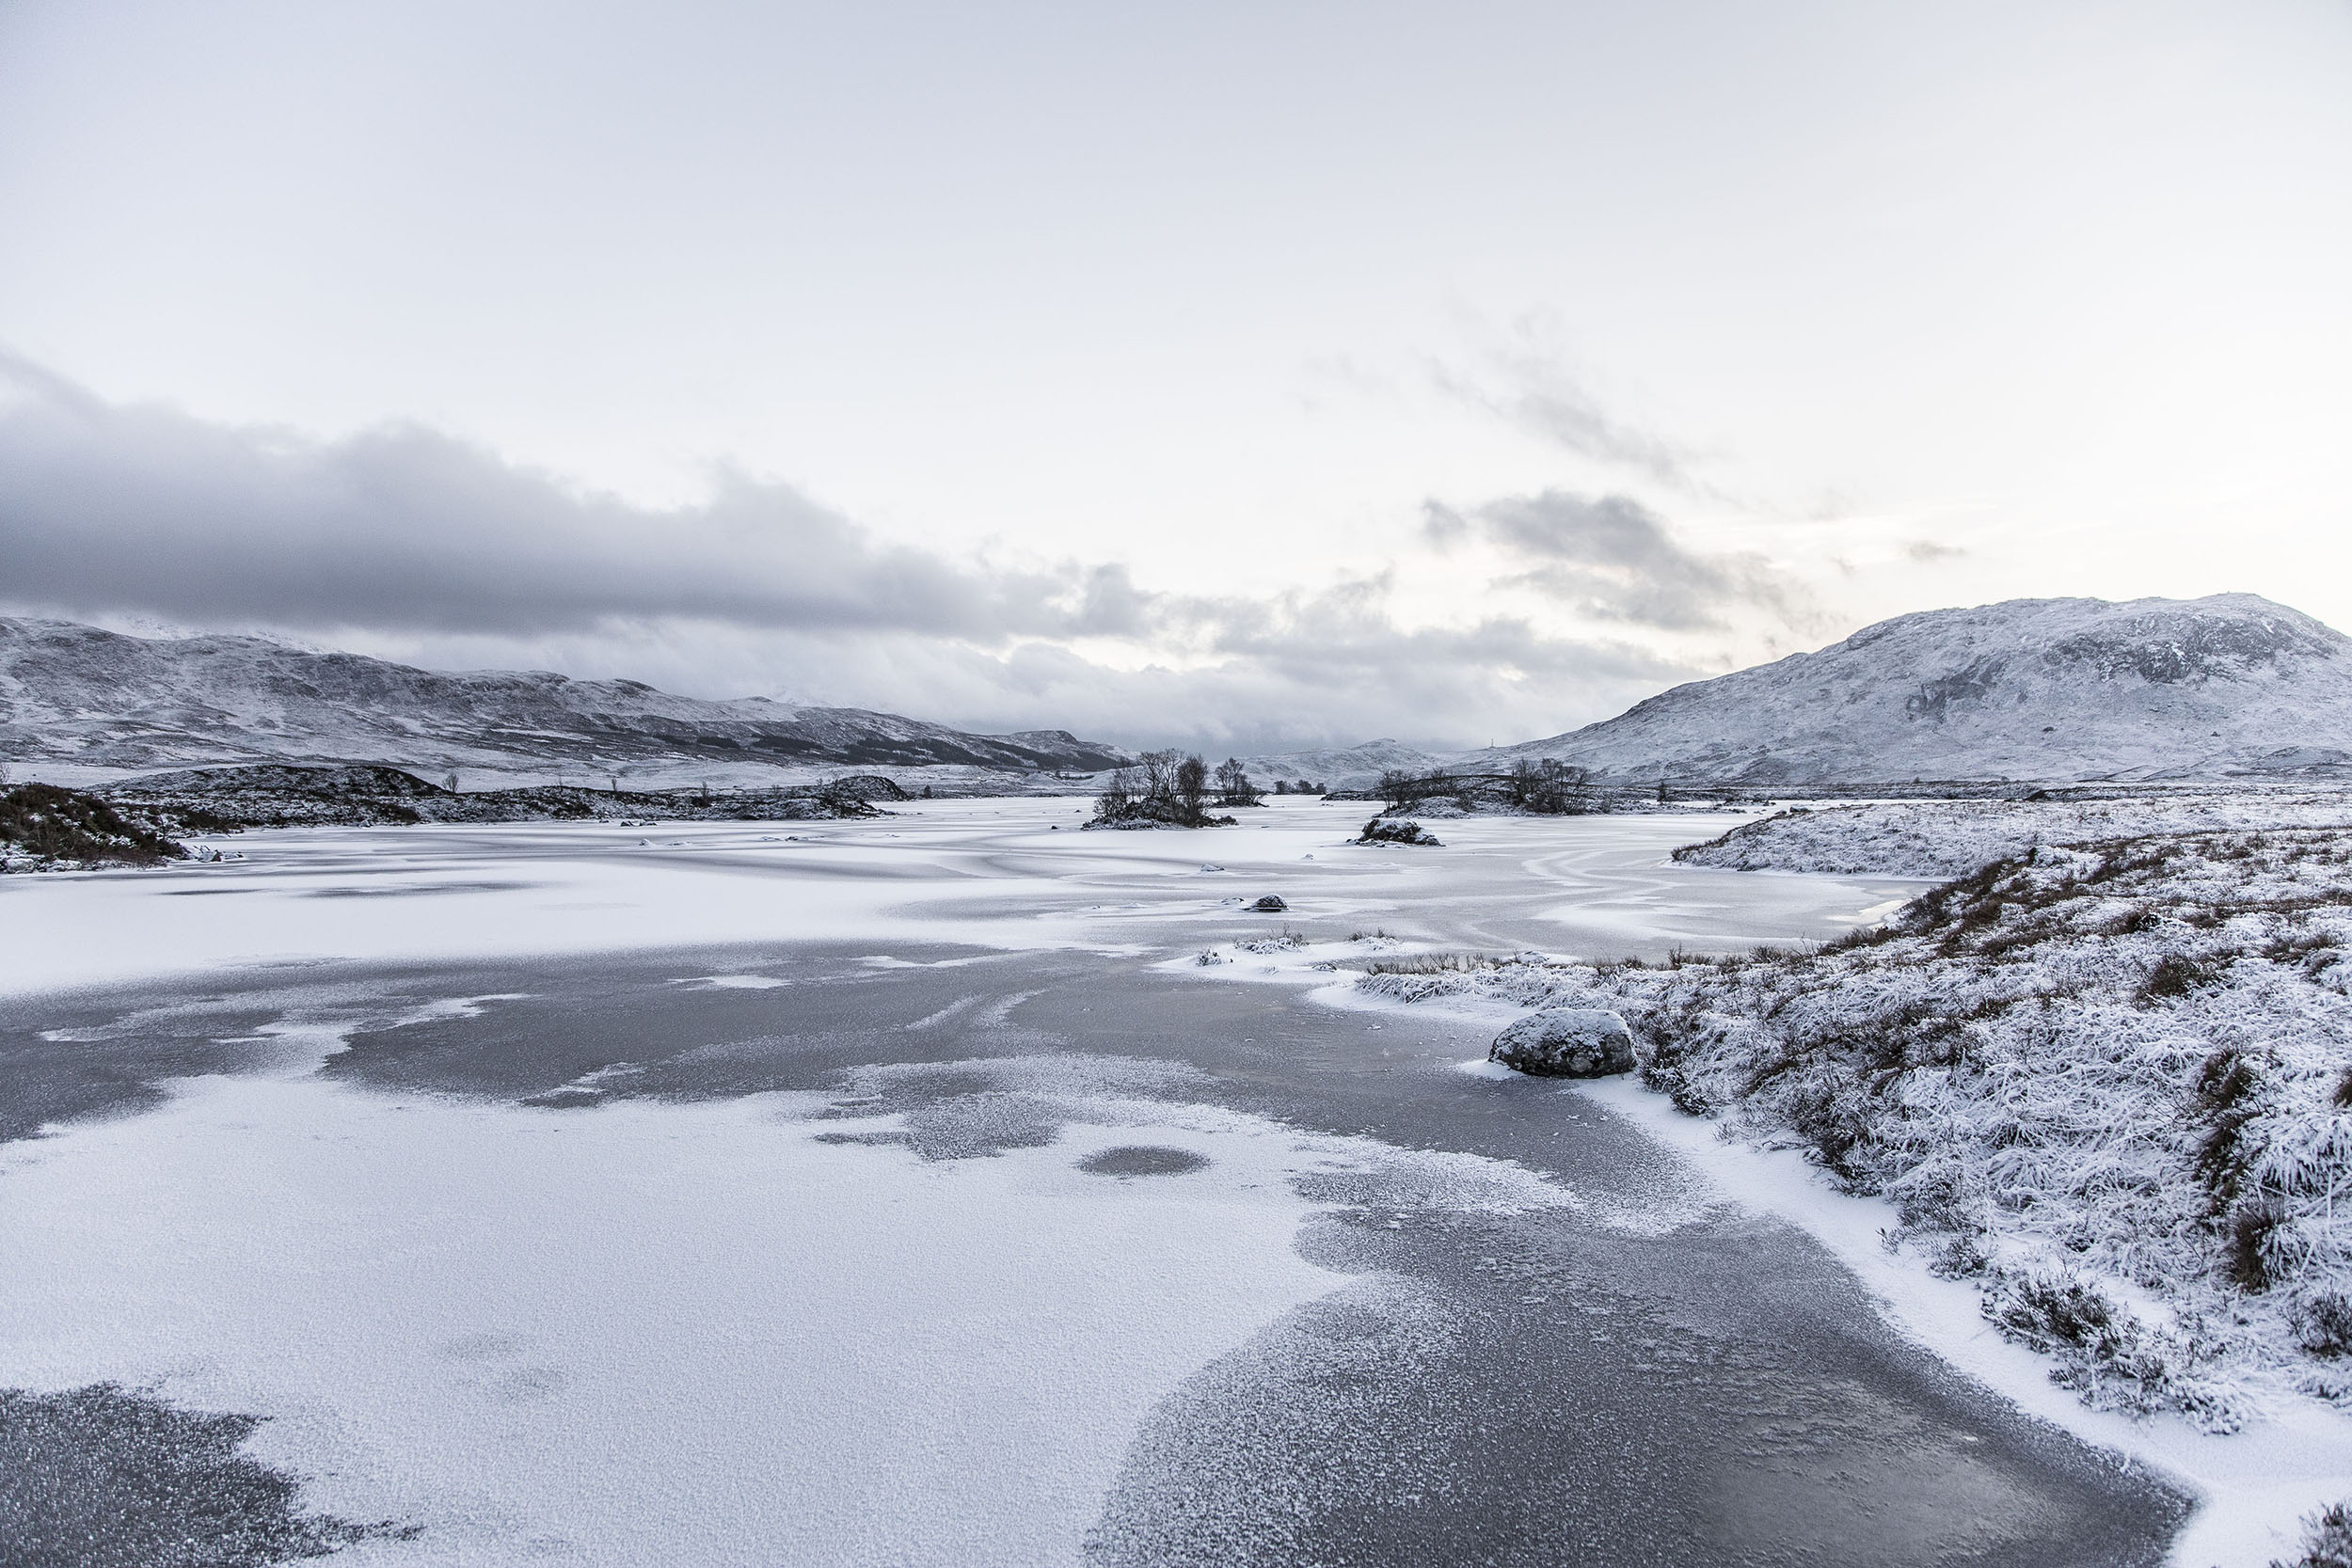 073_IMG_8730_Scotland_Photo_by_Paul_Marc_Mitchell.jpg